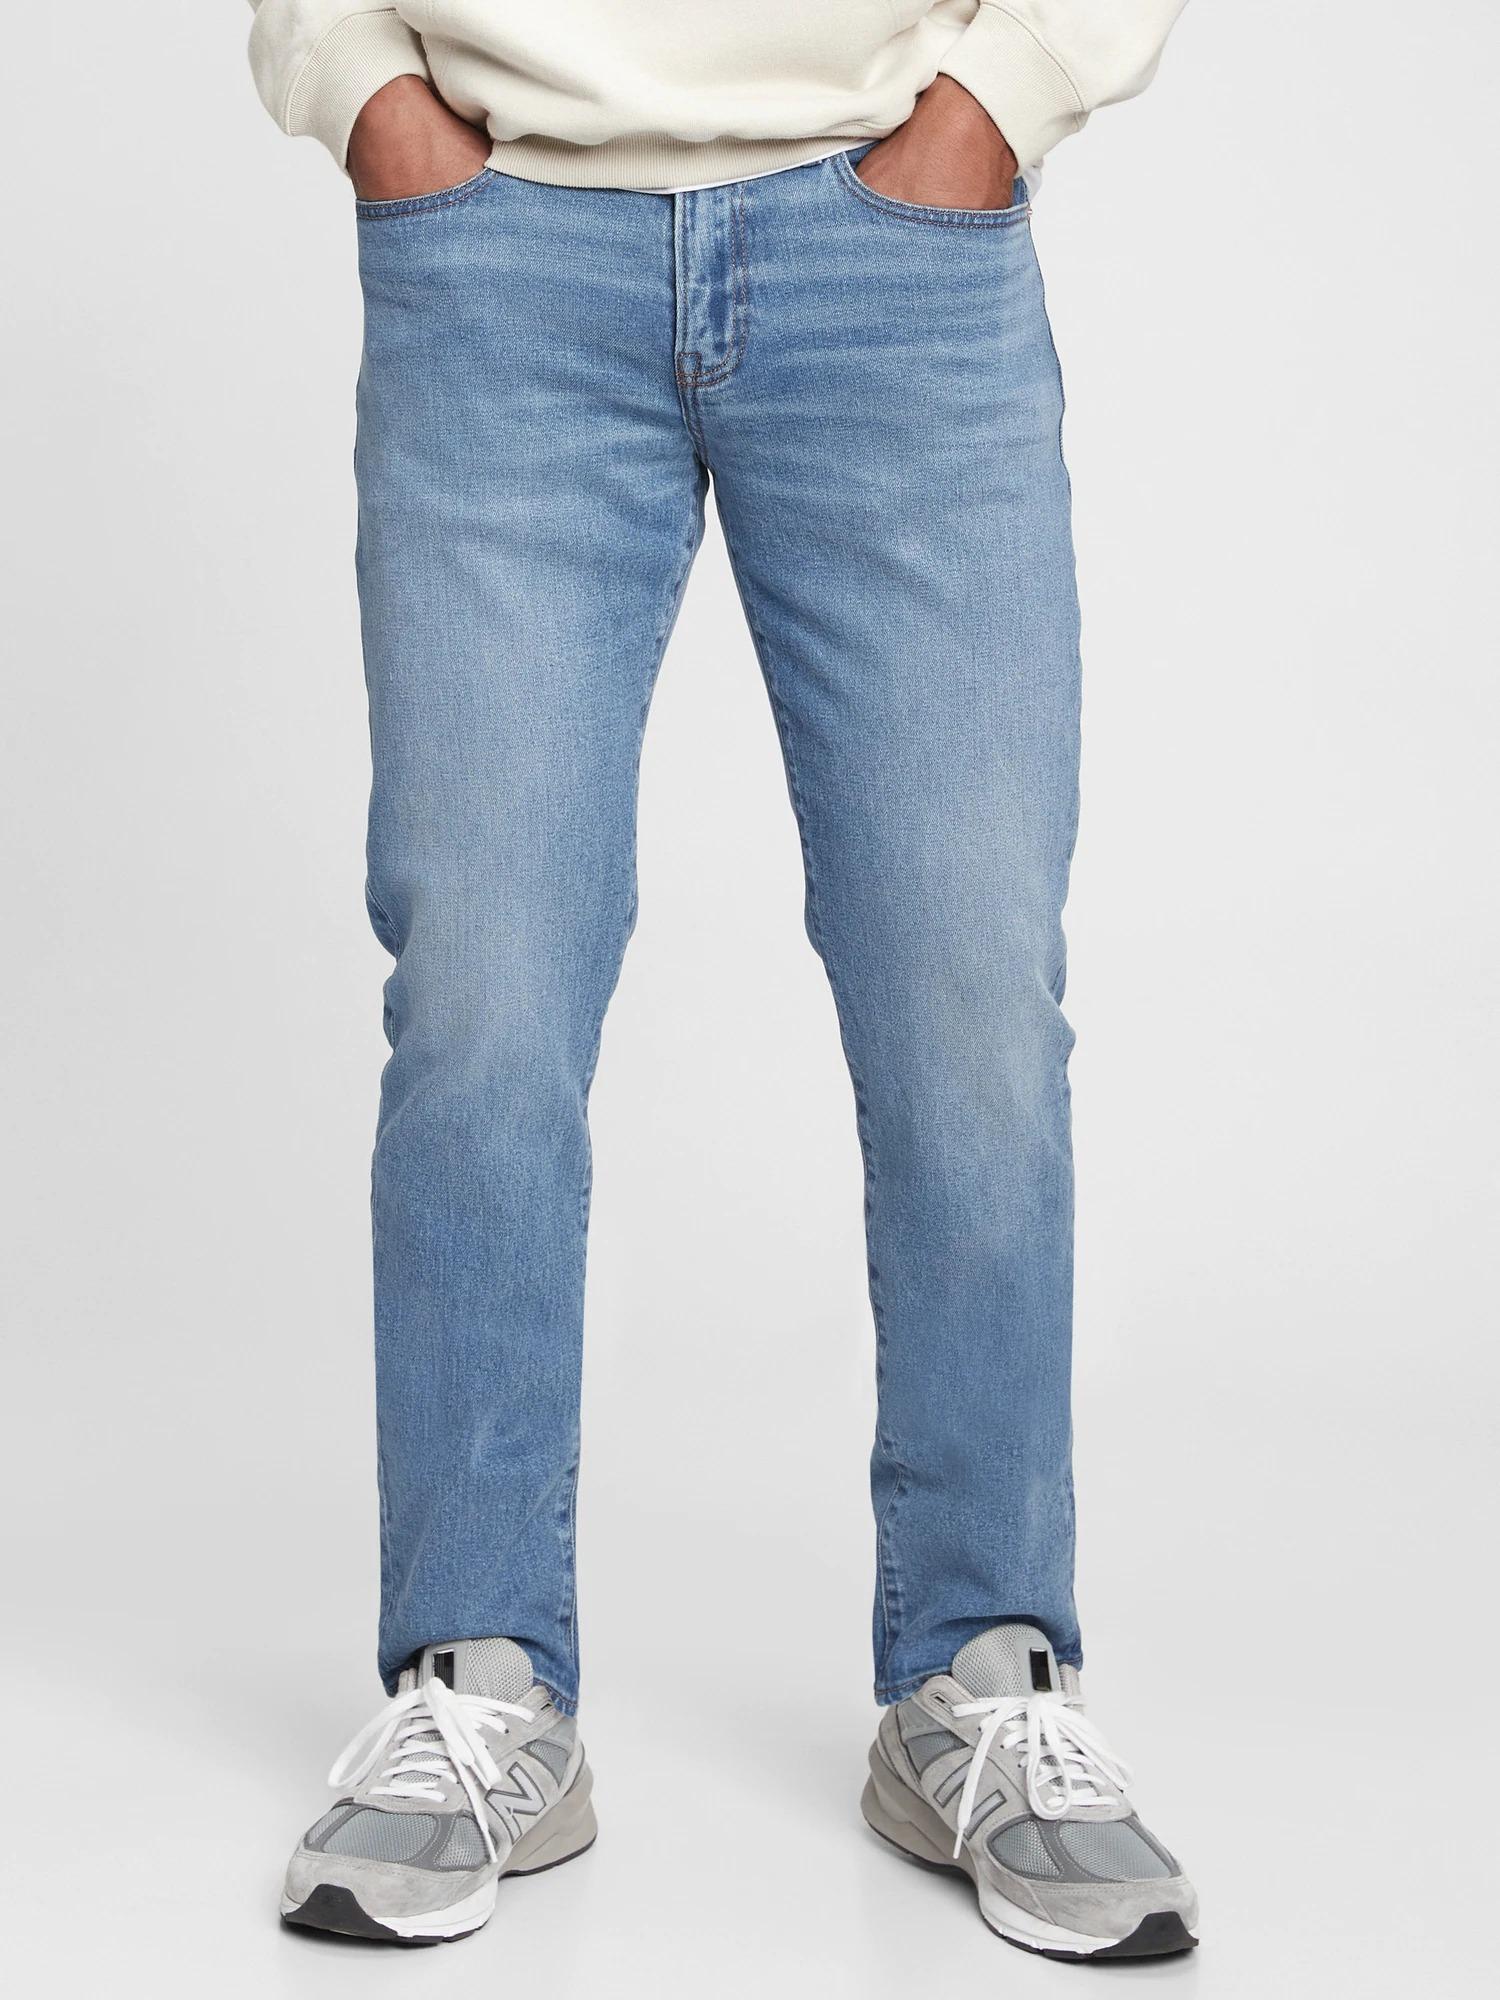 Soft Flex Slim Jeans with Washwell™